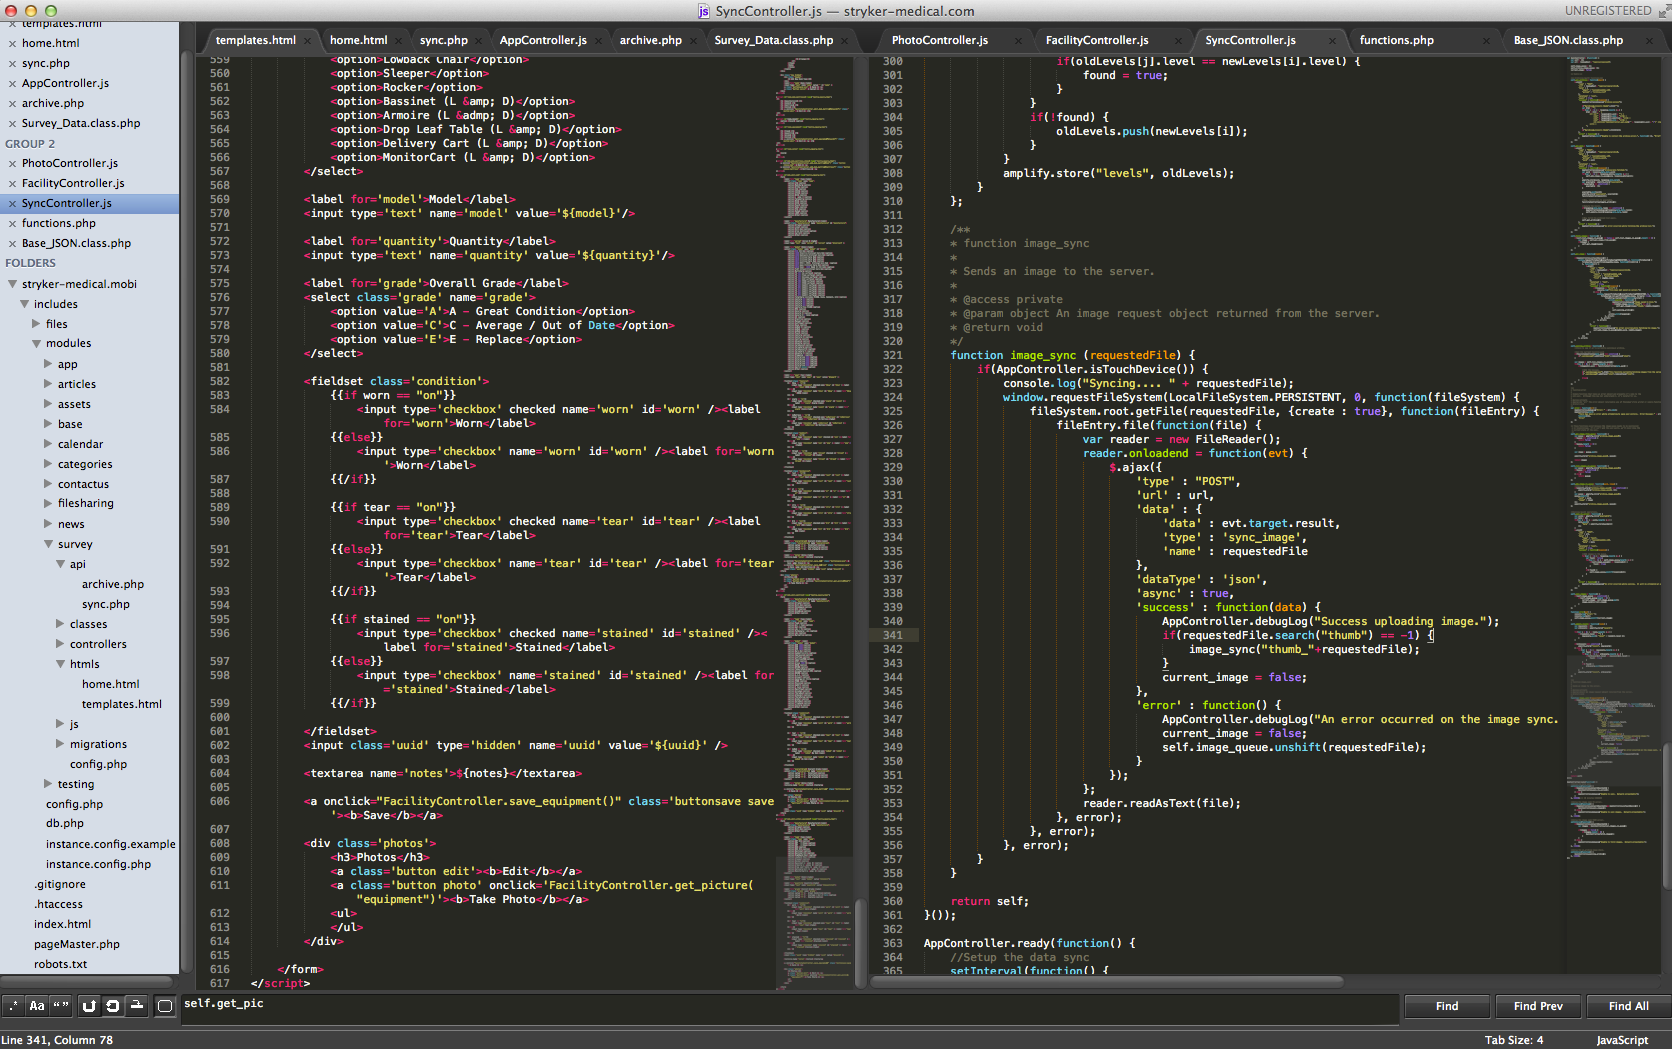 Sublime Text 2 в натуральном программистском виде